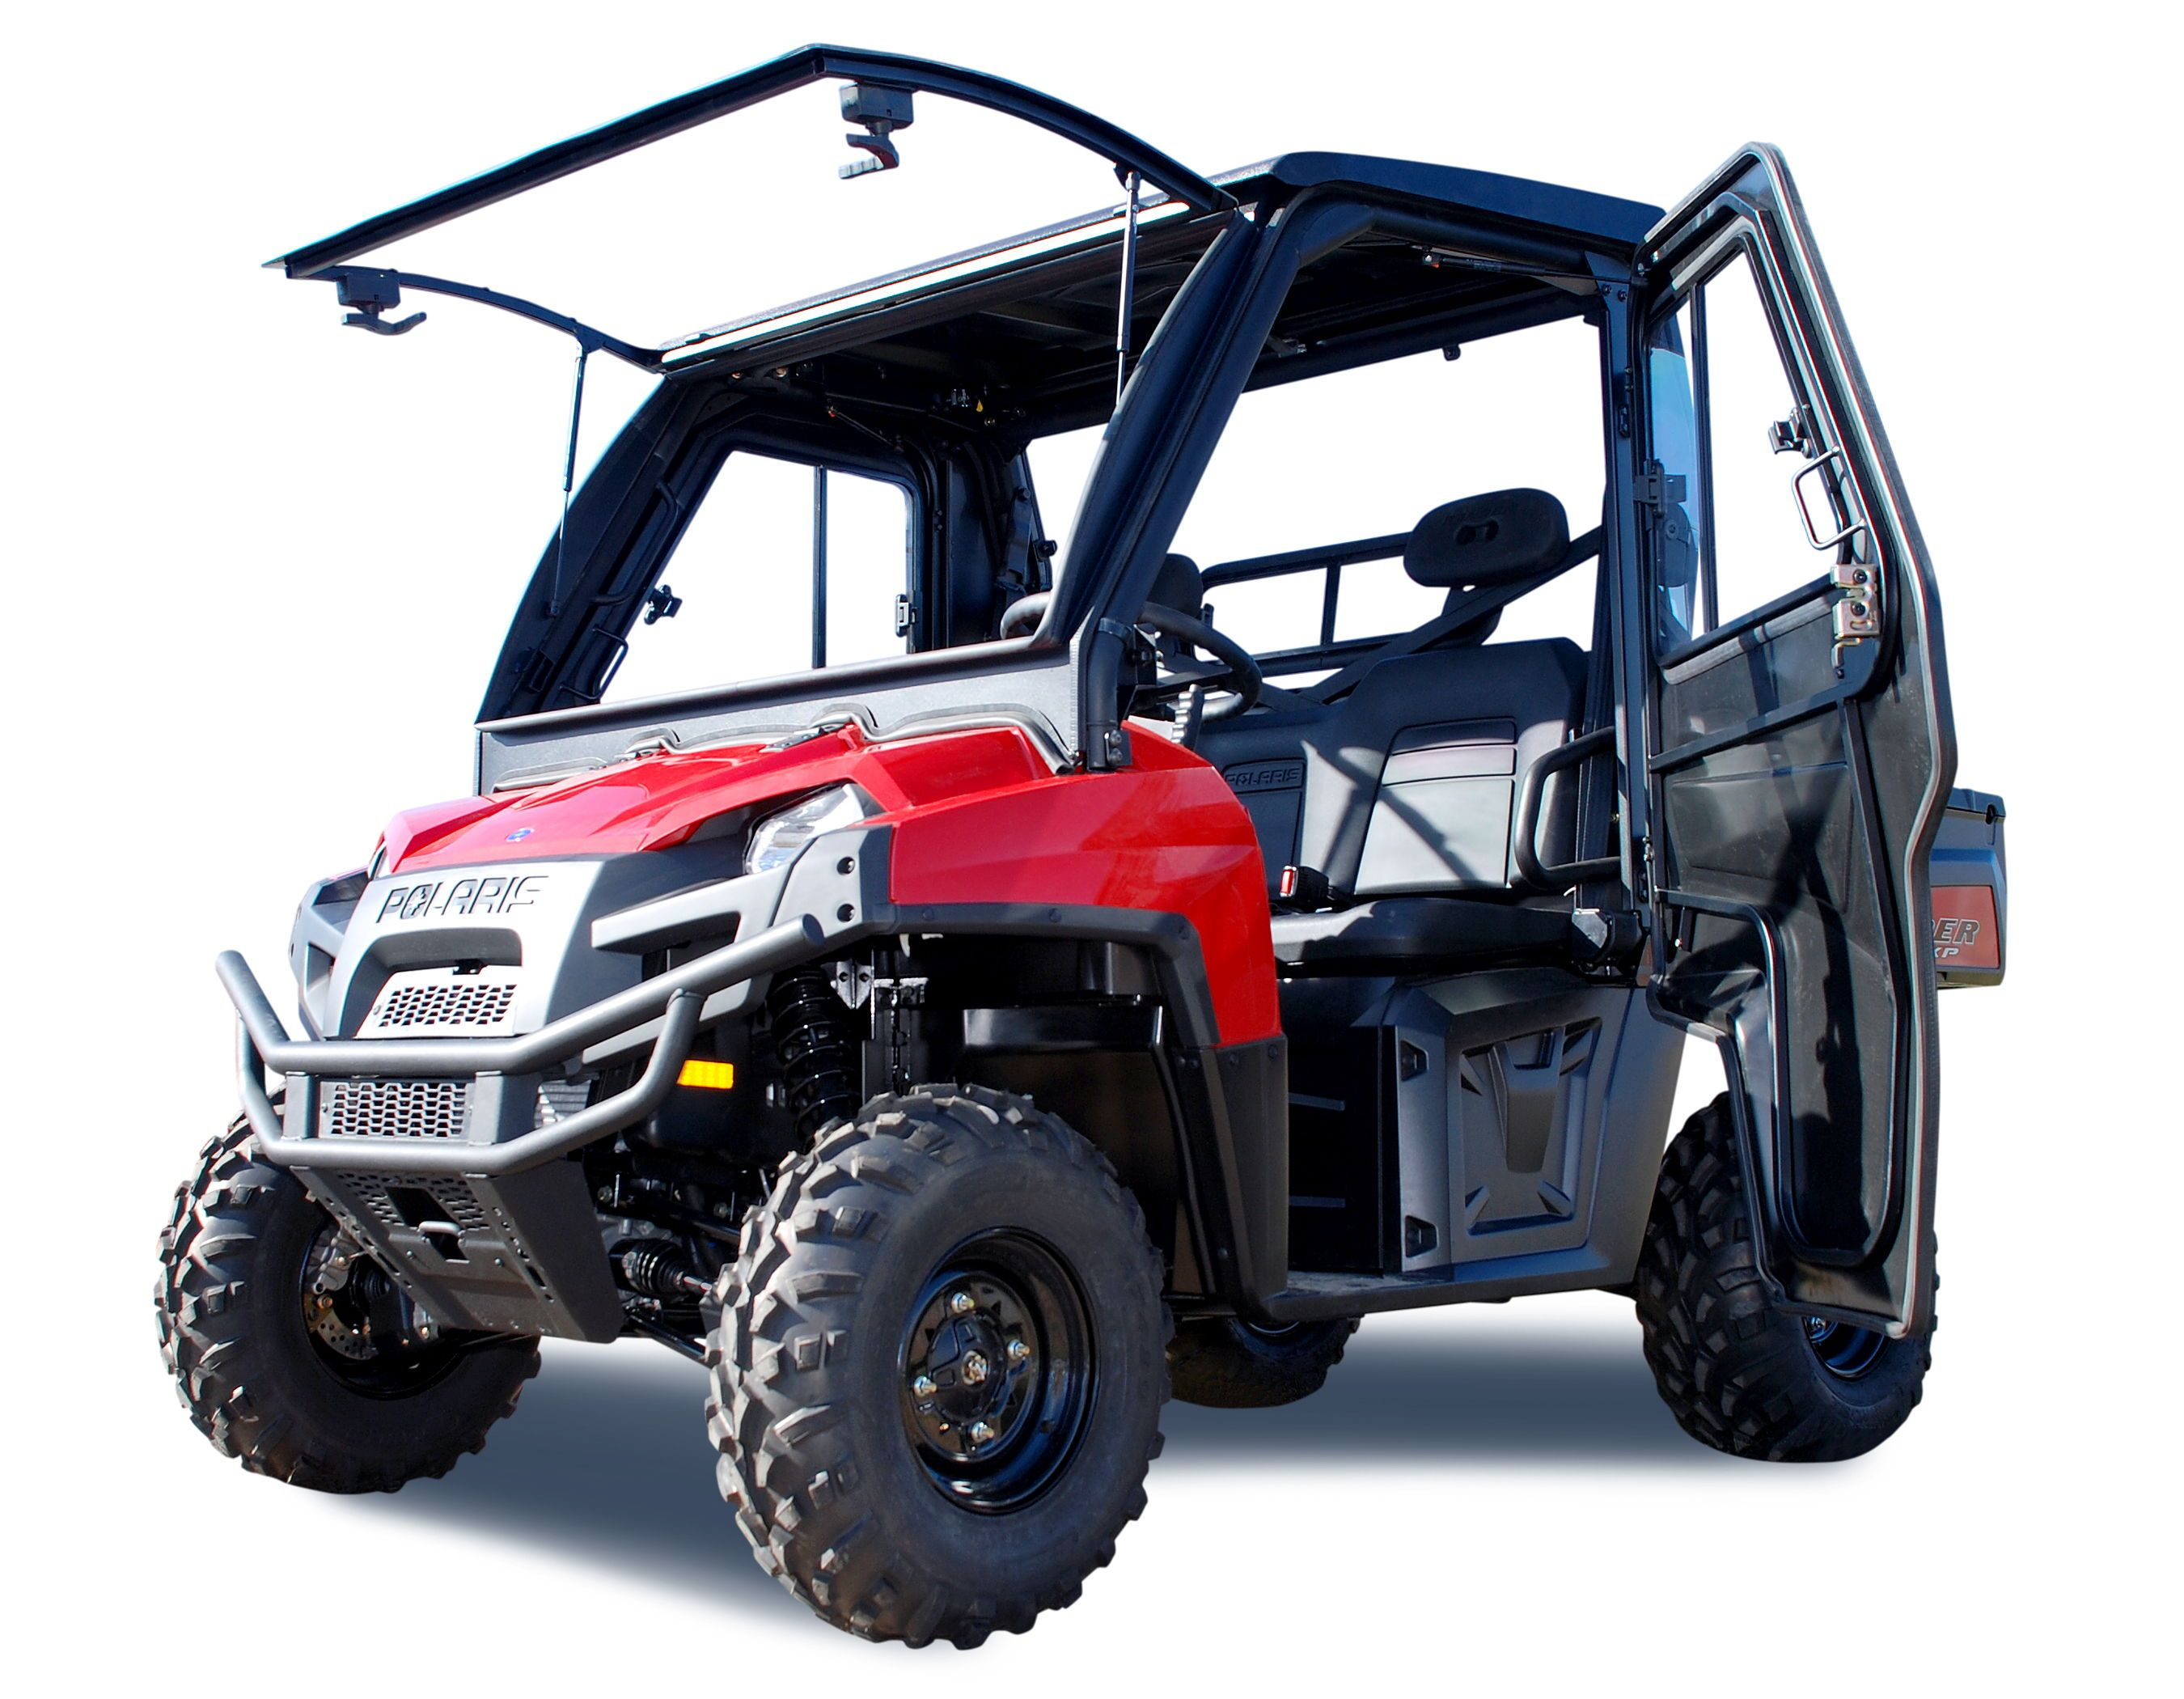 Rapid Convertible Cab System For Polaris Ranger 800 Curtis Industries Polaris Ranger Polaris Ranger 800 Ranger